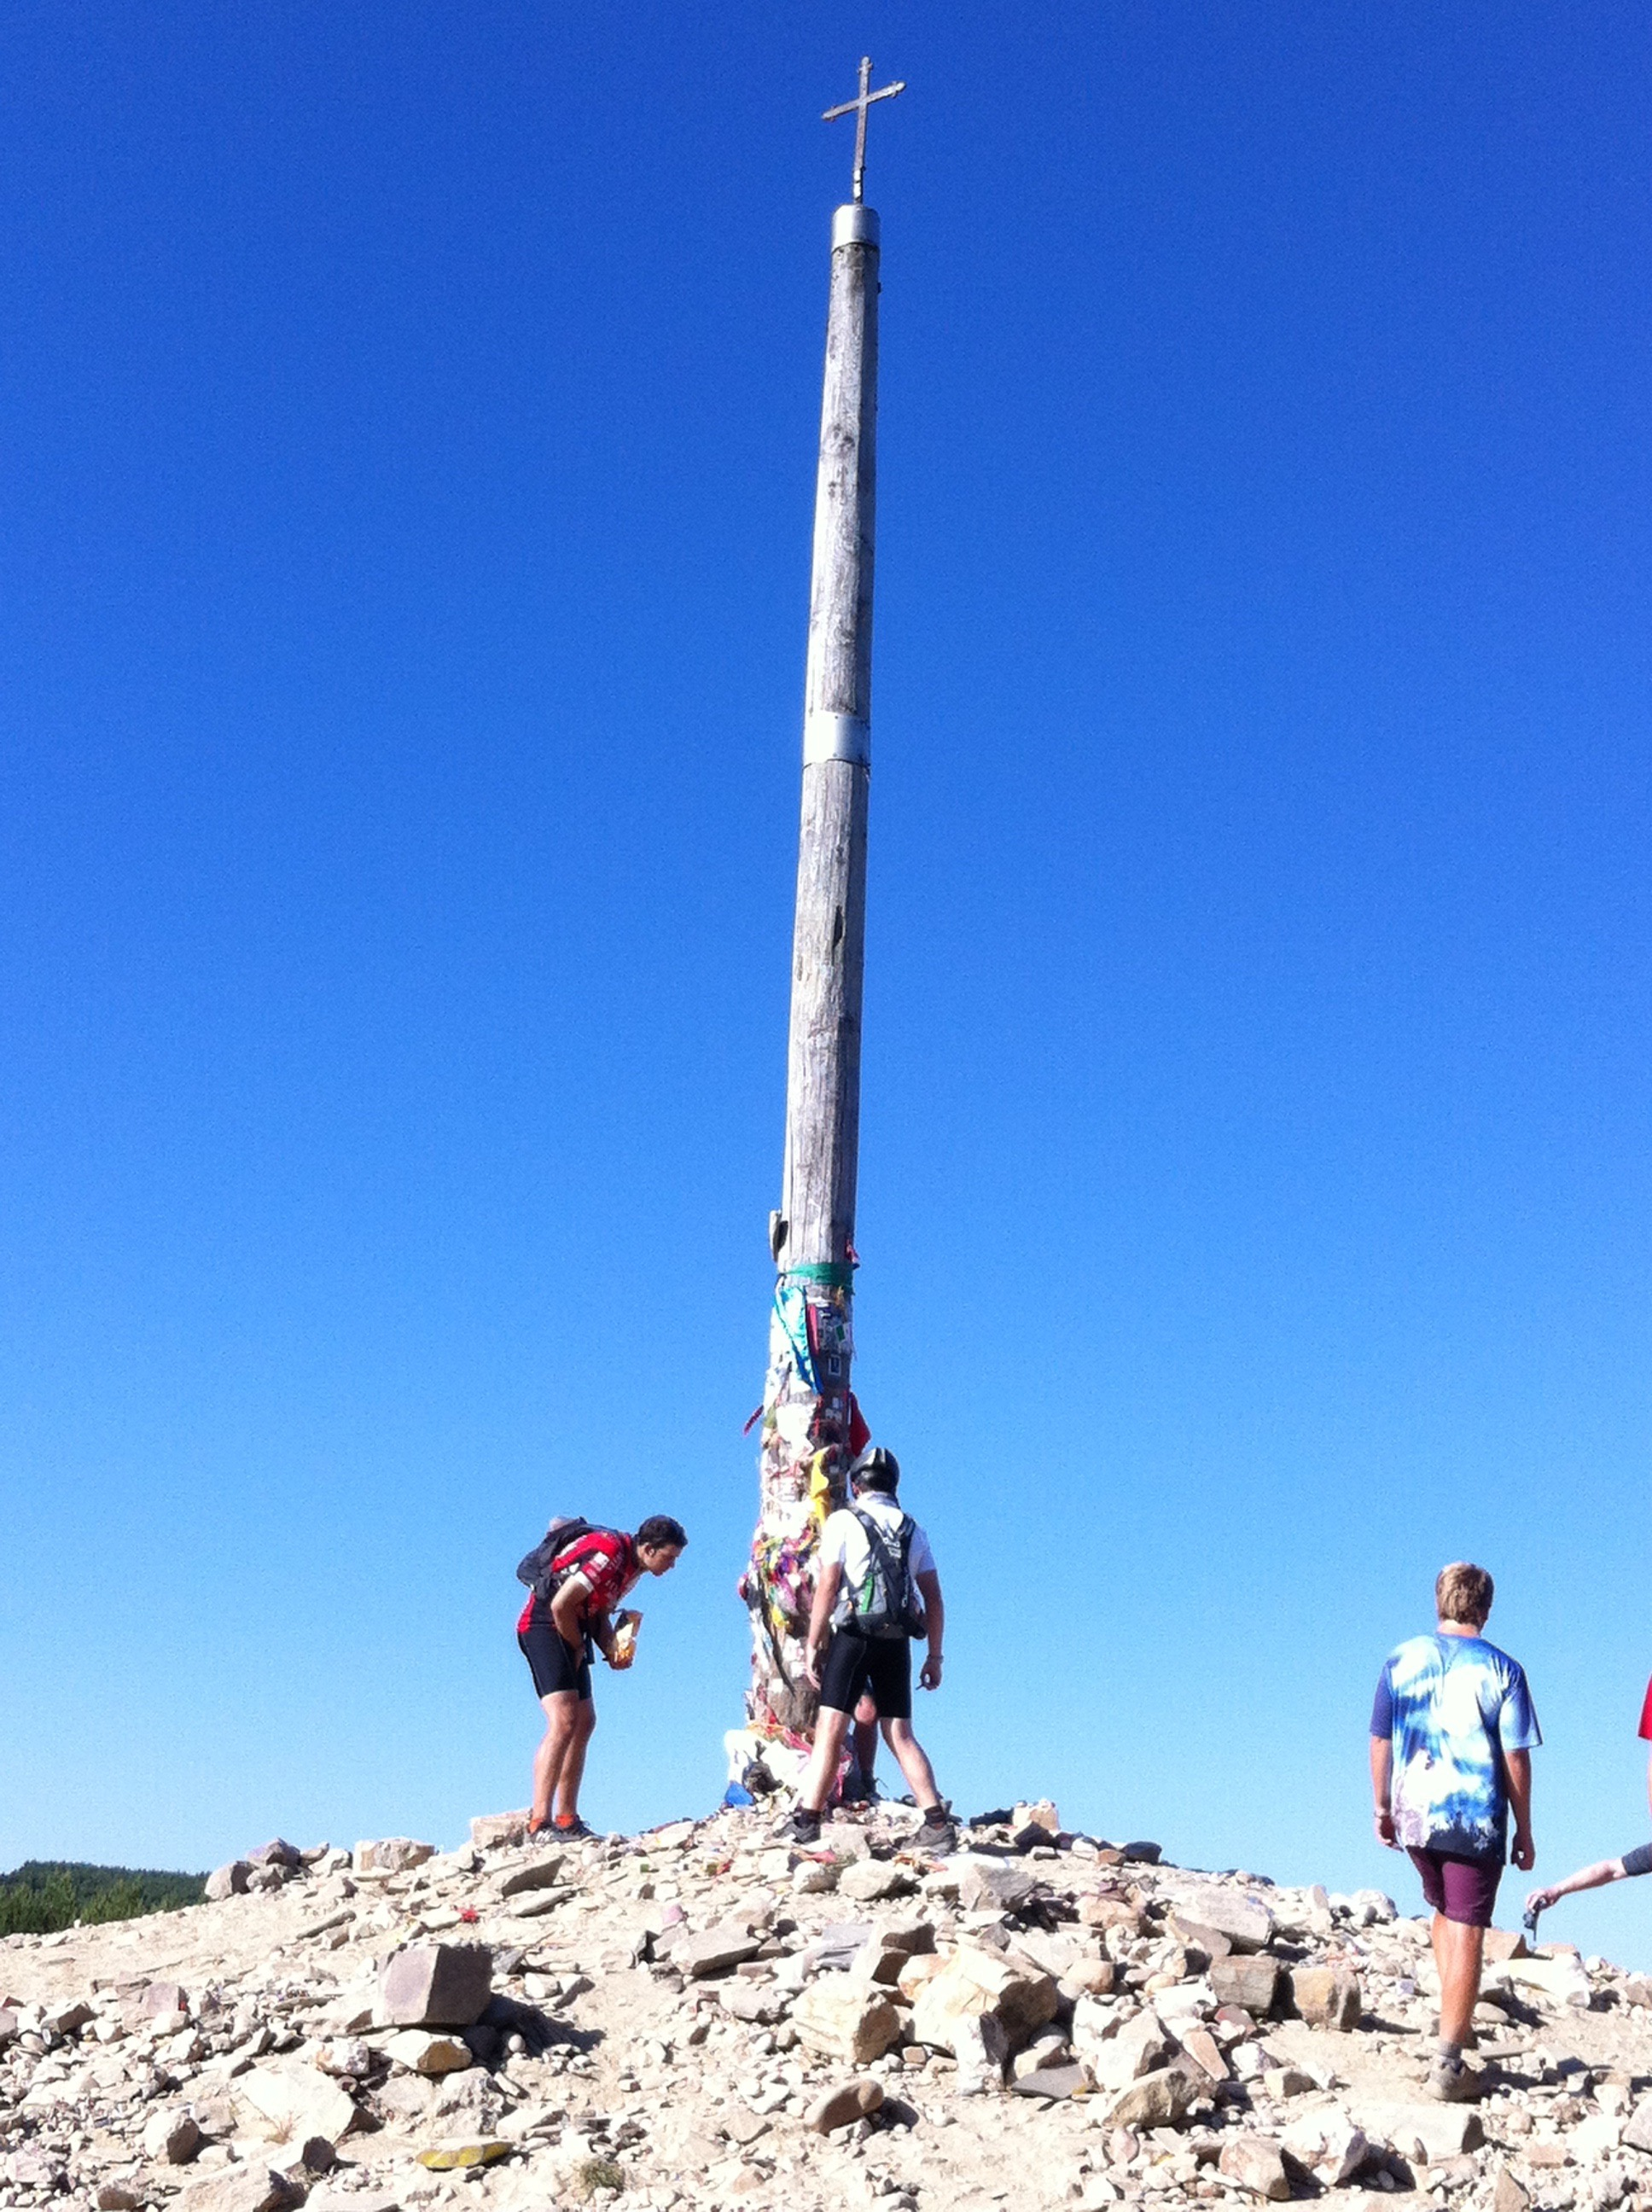 Pilgrims lay their burdens and prayers at the foot of the  Cruz de Ferro